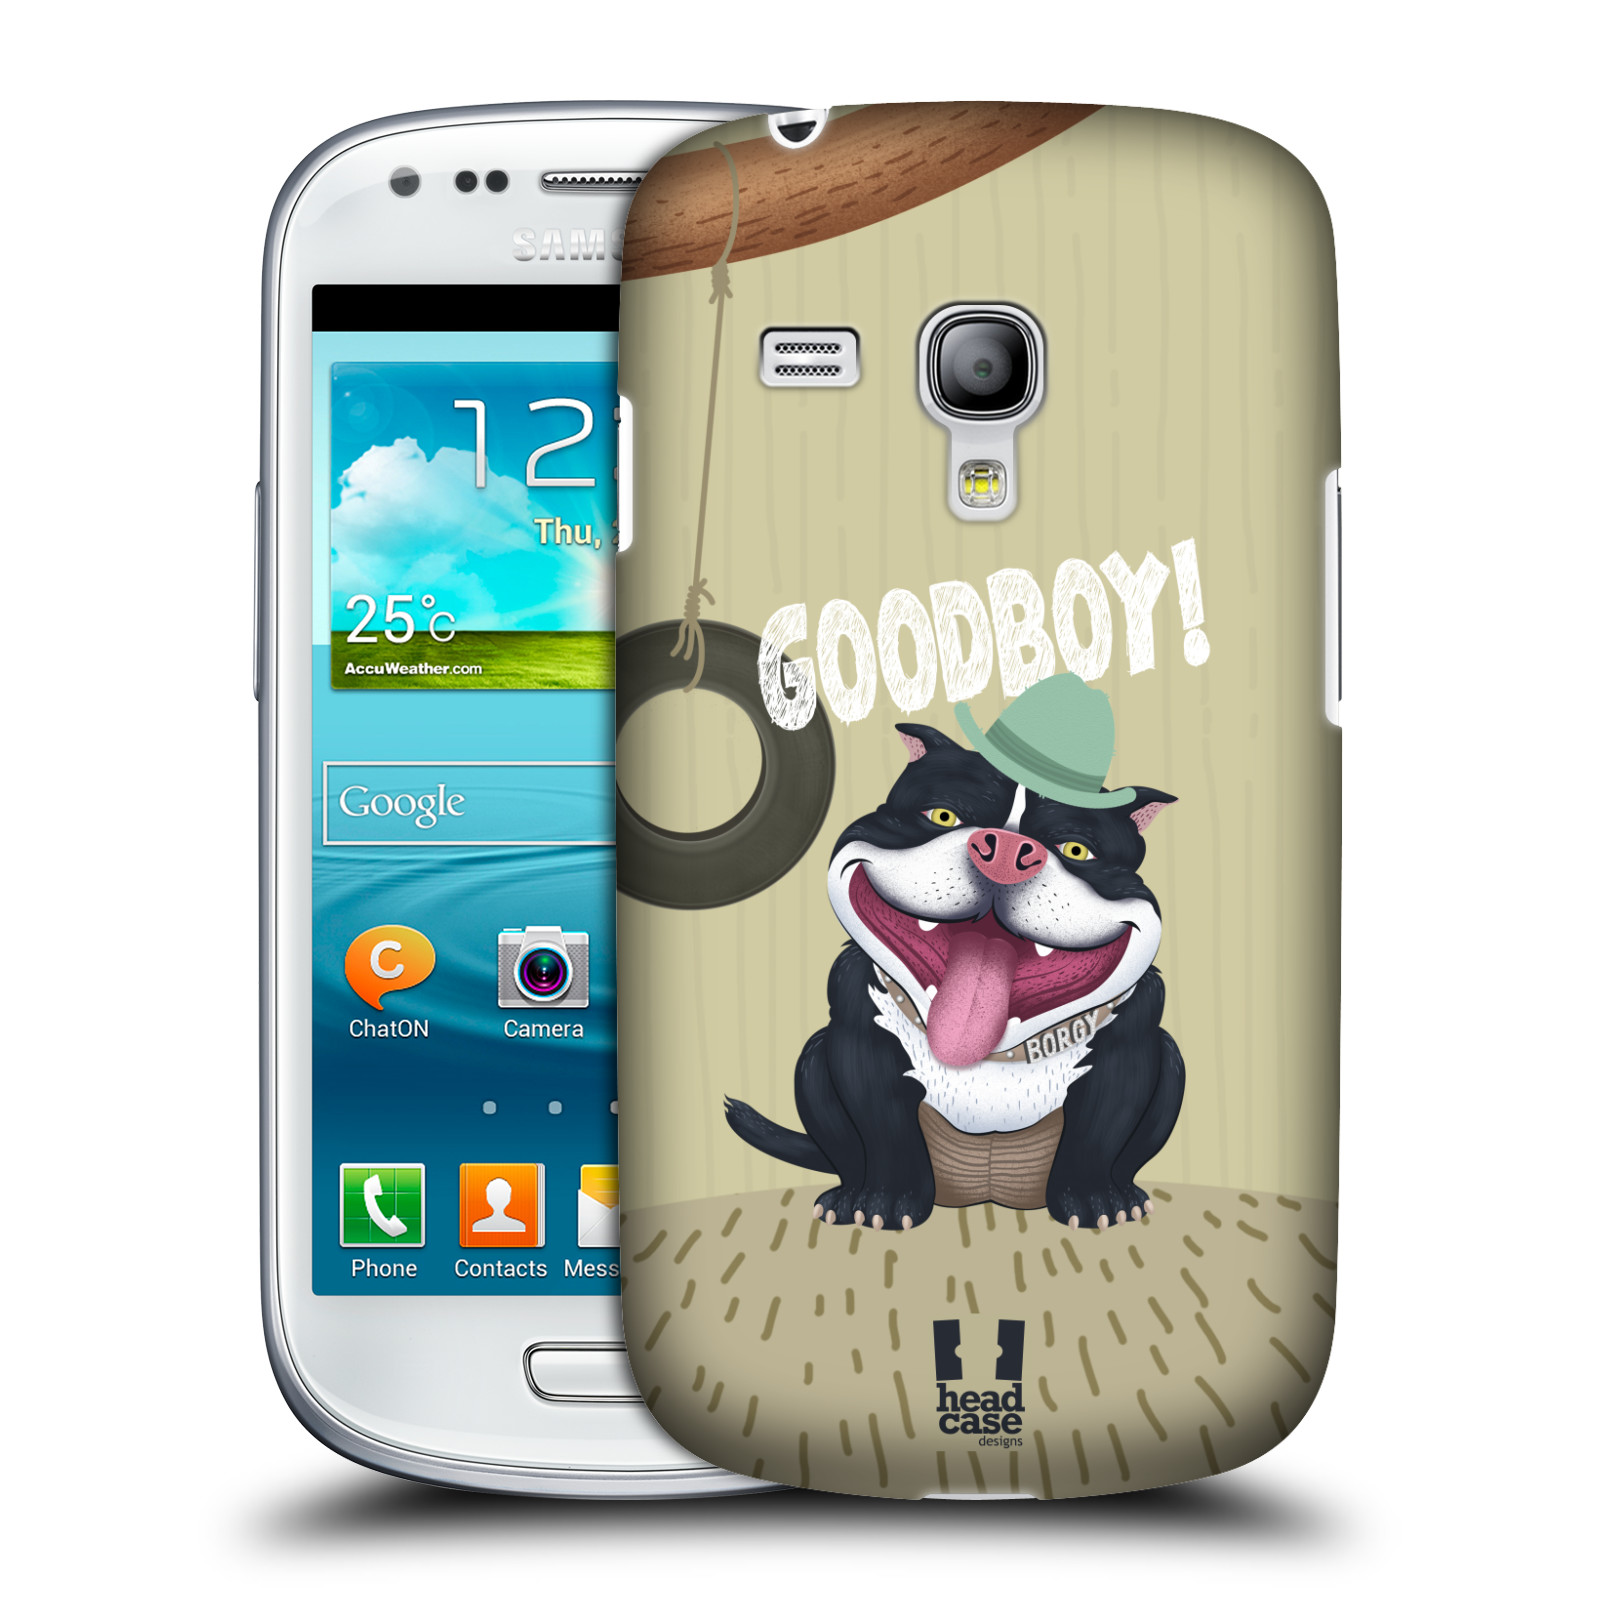 Plastové pouzdro na mobil Samsung Galaxy S III Mini HEAD CASE Goodboy! Pejsek (Kryt či obal na mobilní telefon Samsung Galaxy S III Mini GT-i8190)